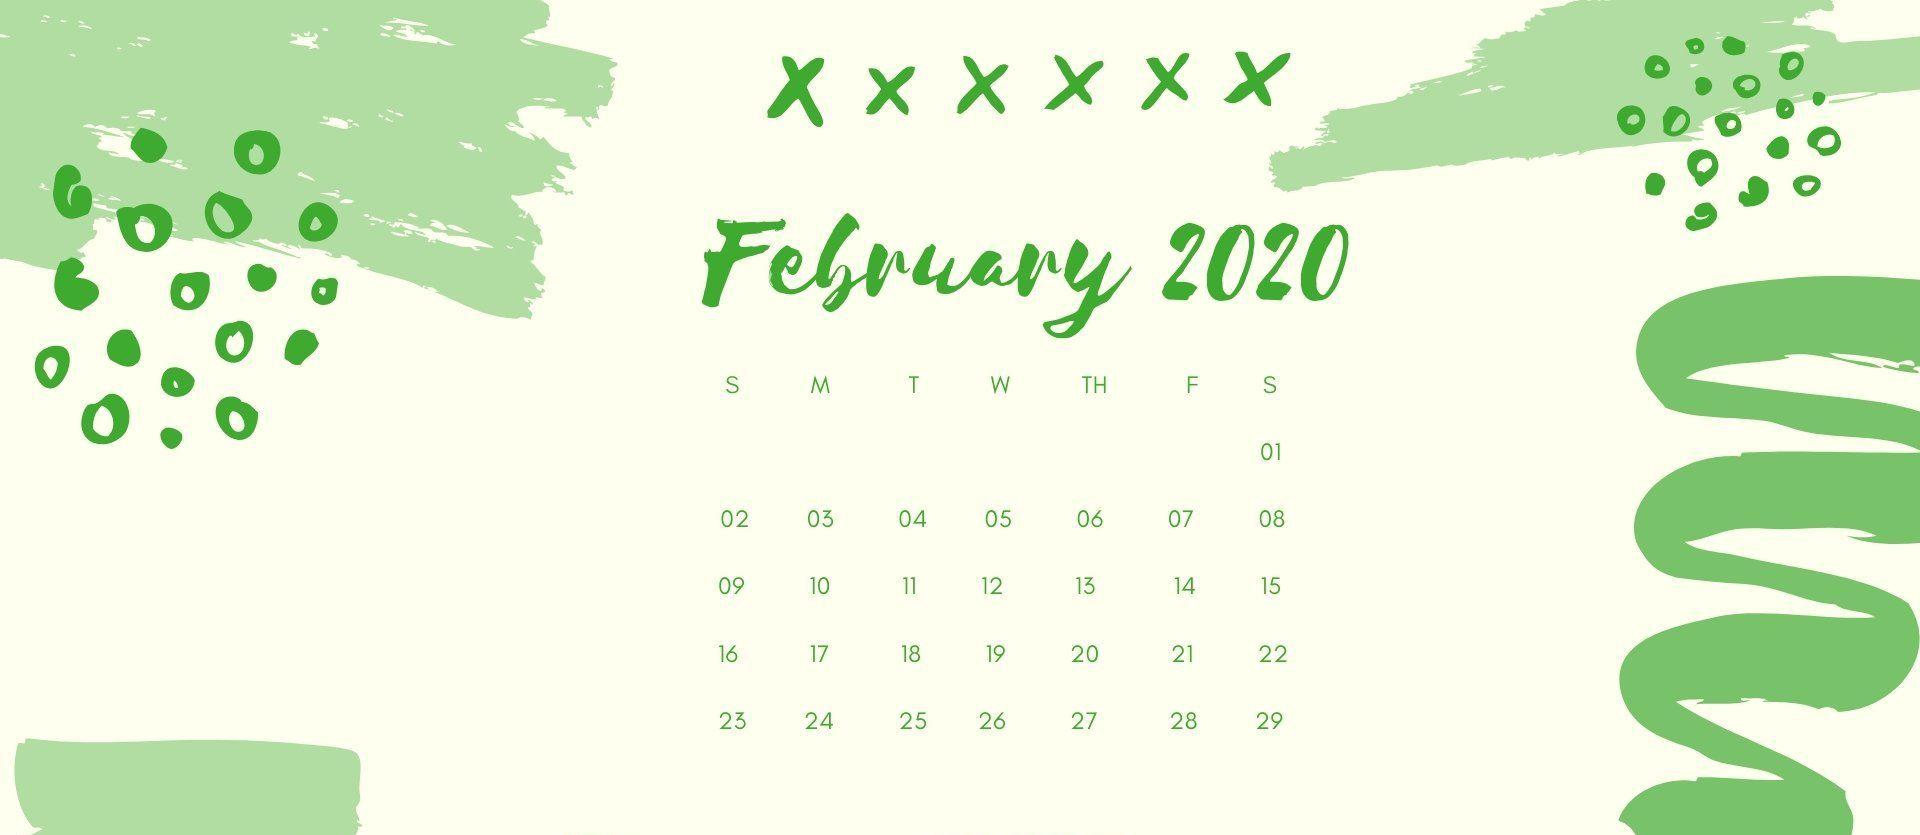 February Calendar 2020 Wallpaper